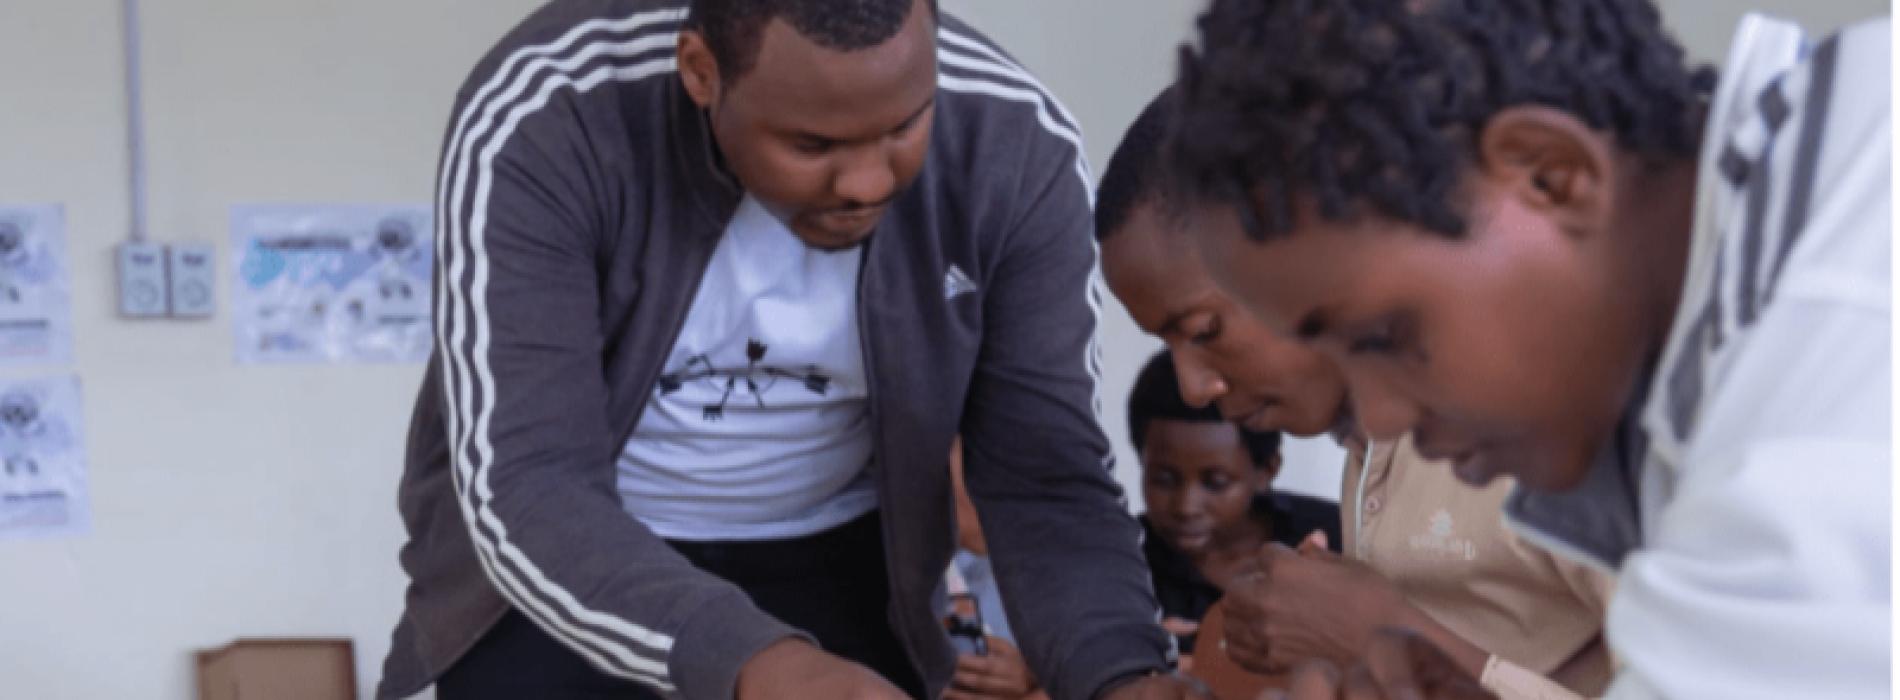 Le lingue africane e il riconoscimento vocale